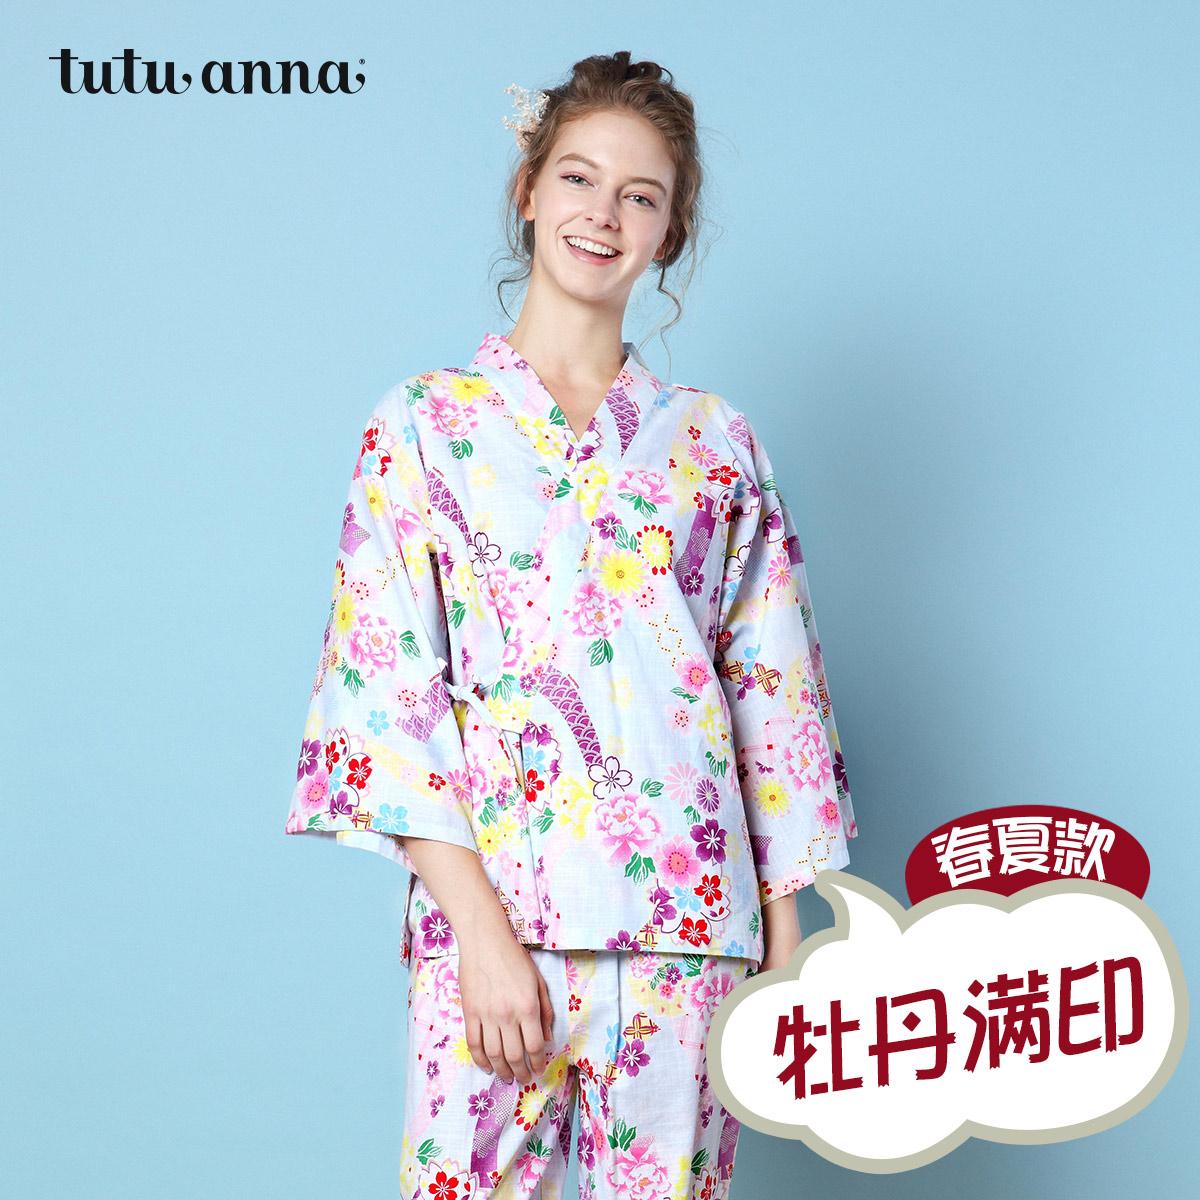 tutuanna2018春夏新款 睡衣女 和风甚平 牡丹花满印 家居服上下套